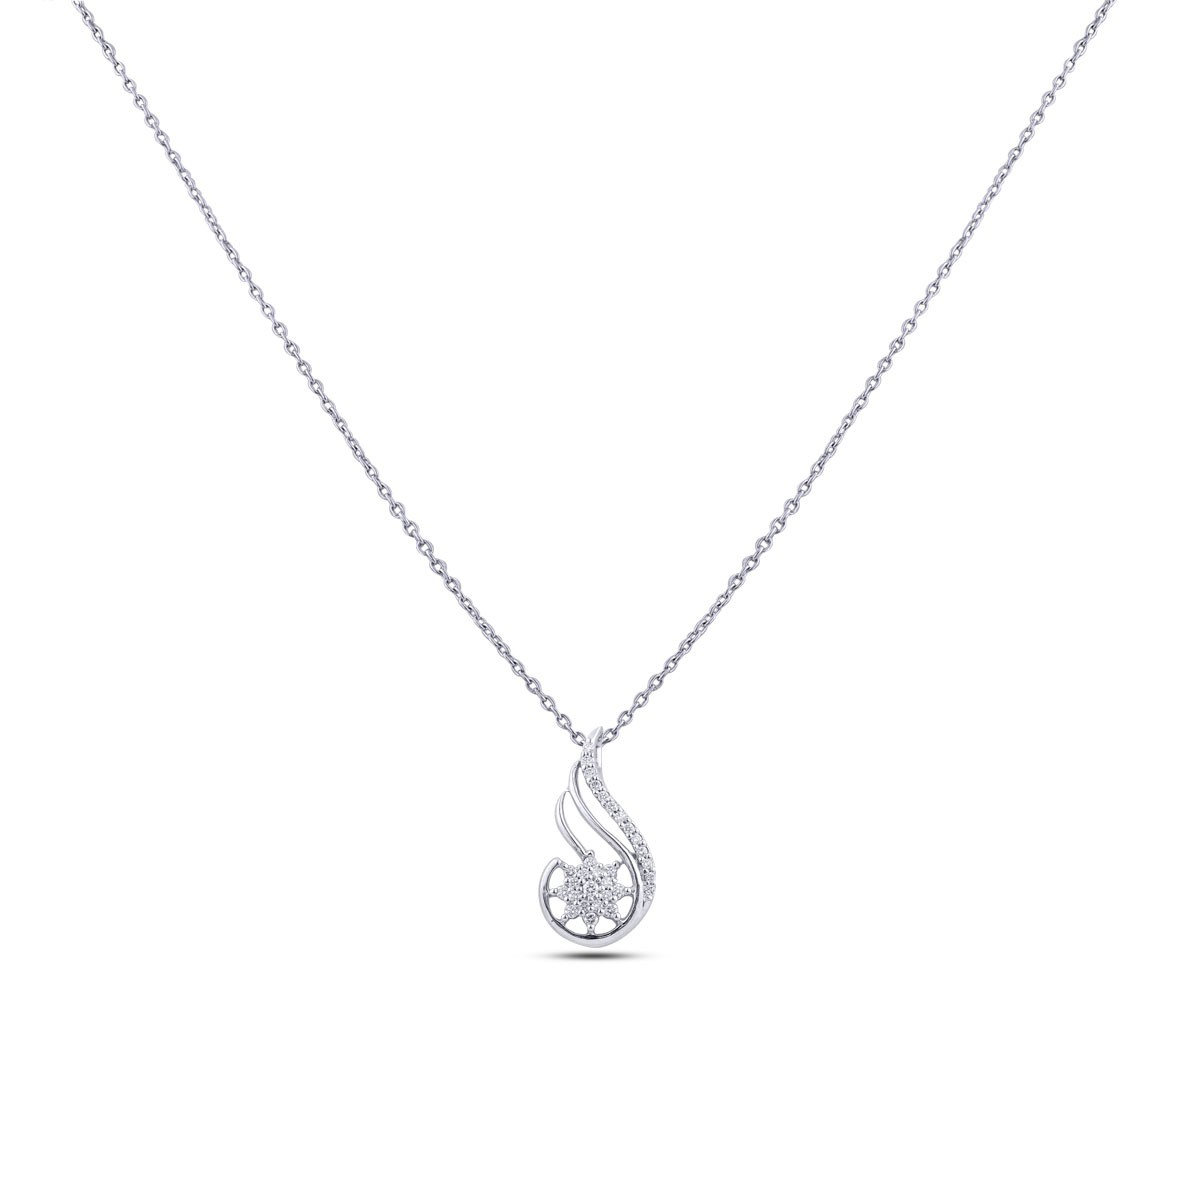 Stavra Diamond Pendant with Chain